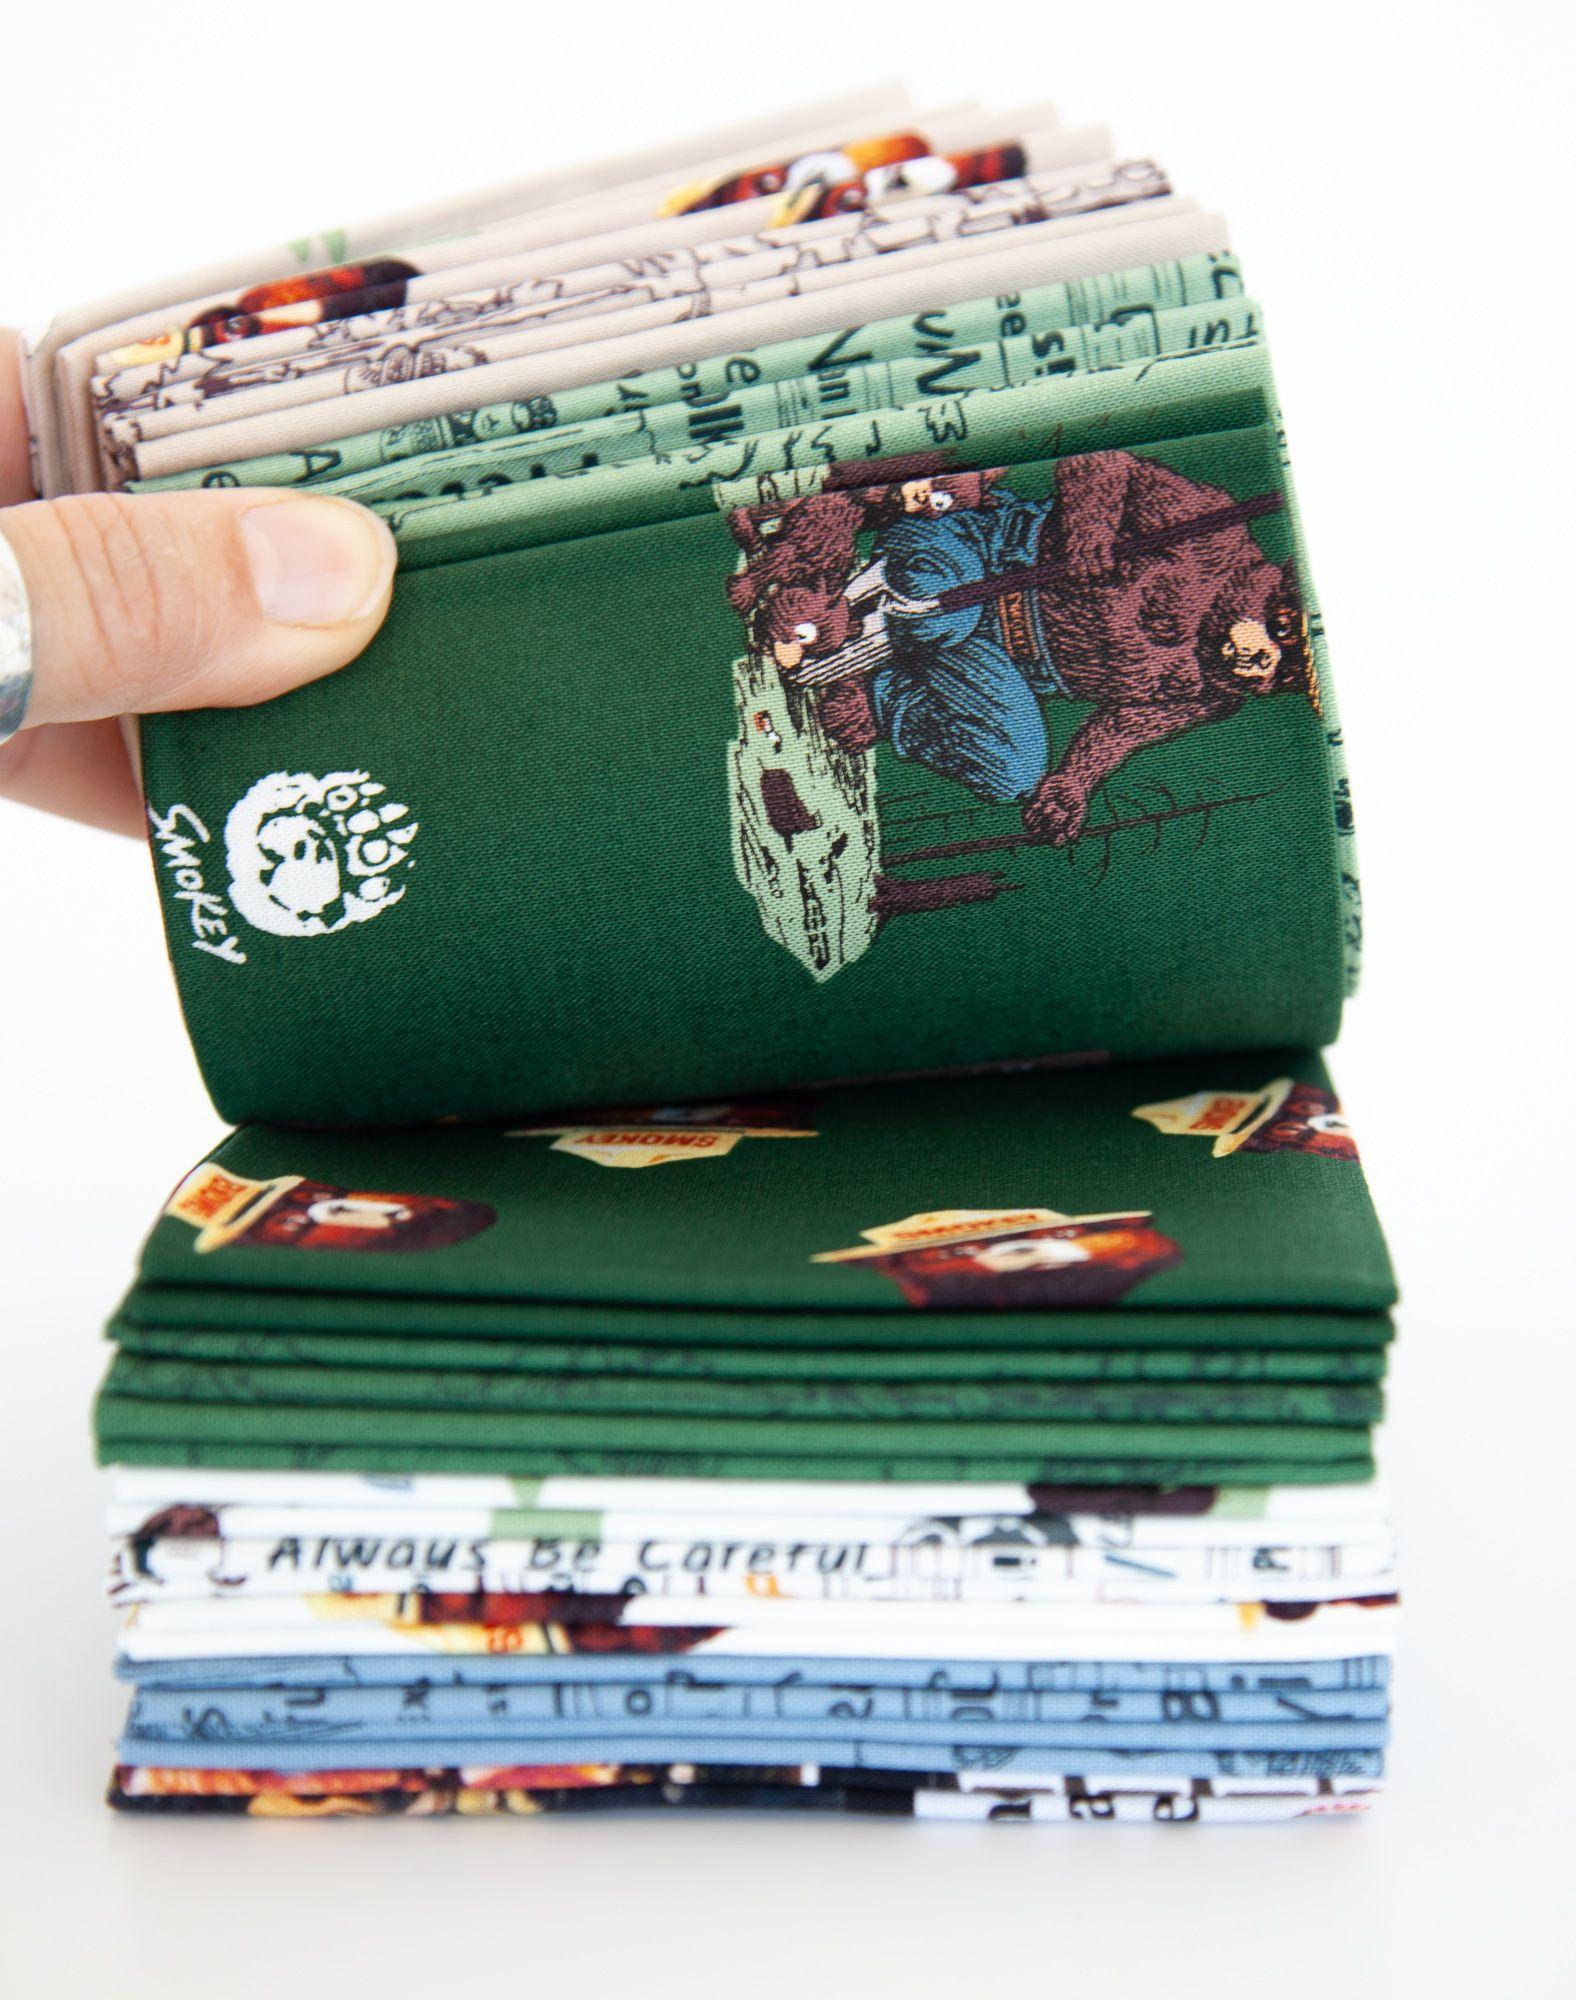 Smokey Bear Panel Quilt Free Pattern Riley Blake Designs In 2021 Bear Quilts Riley Blake Designs Camping Quilt